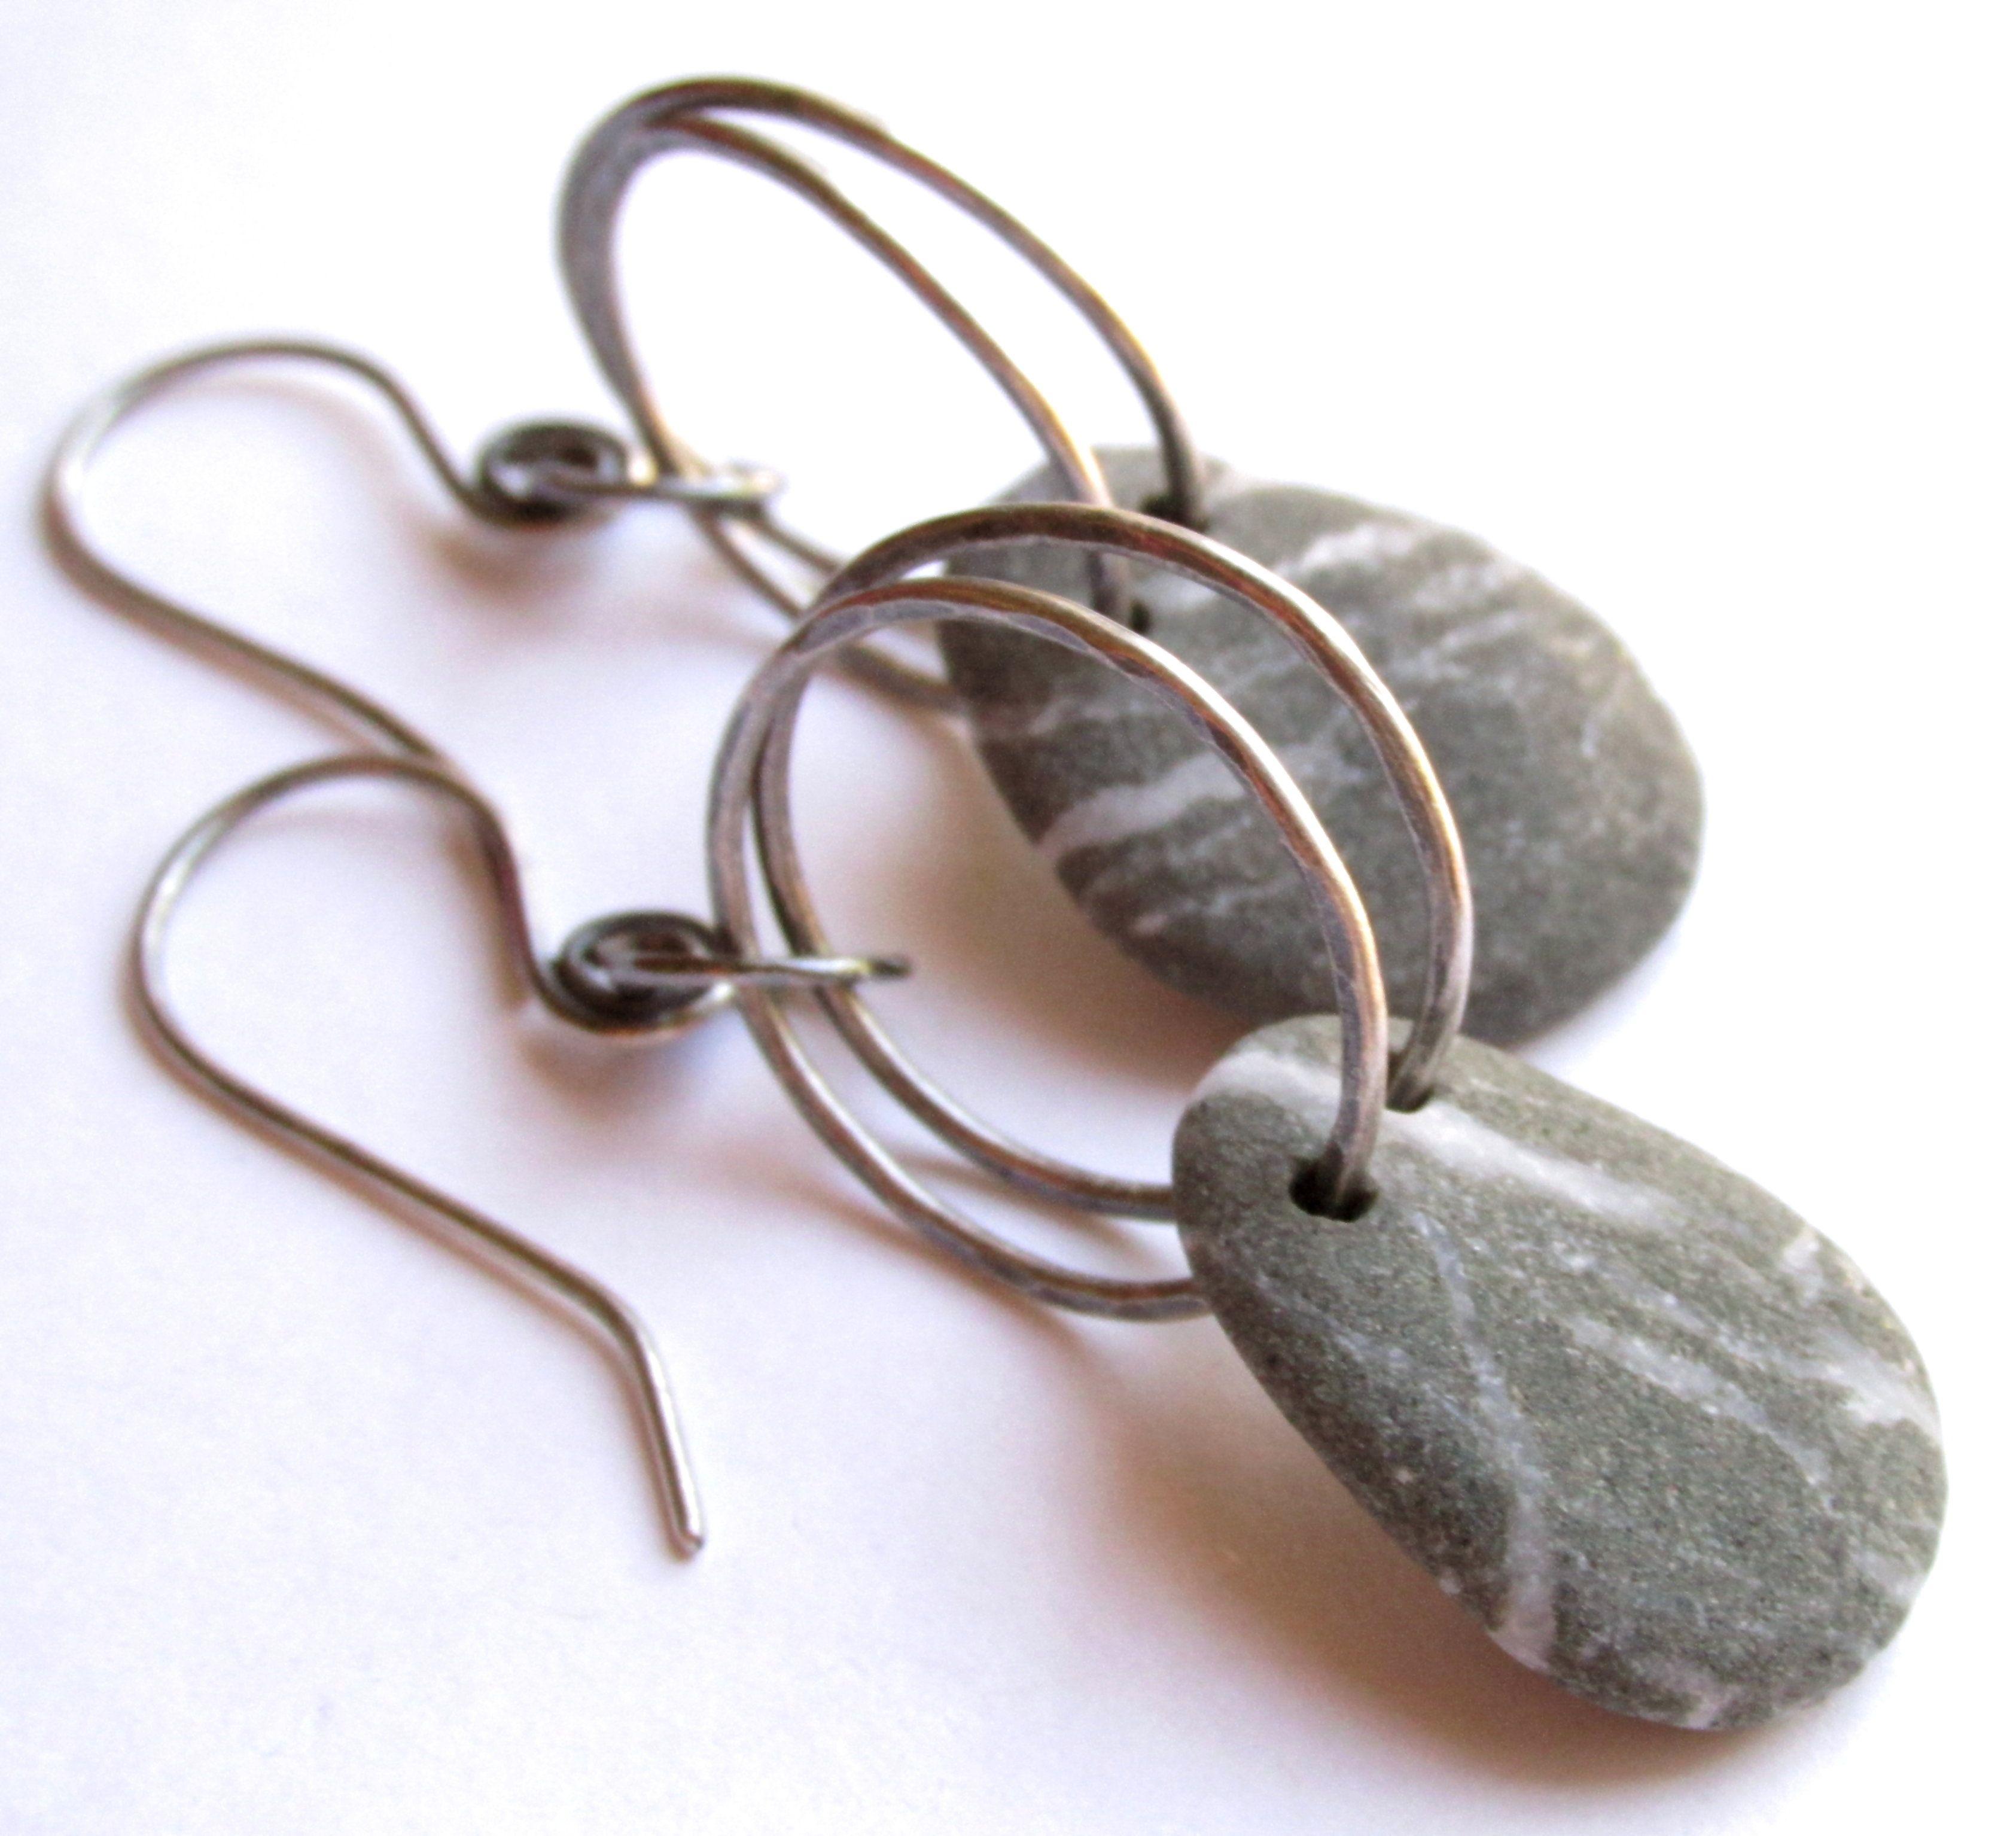 Sterling Silver - Double Hoop - Beach Stone Earrings www.rmddesigns.com #earrings #metalsmith #silversmith #jewelry